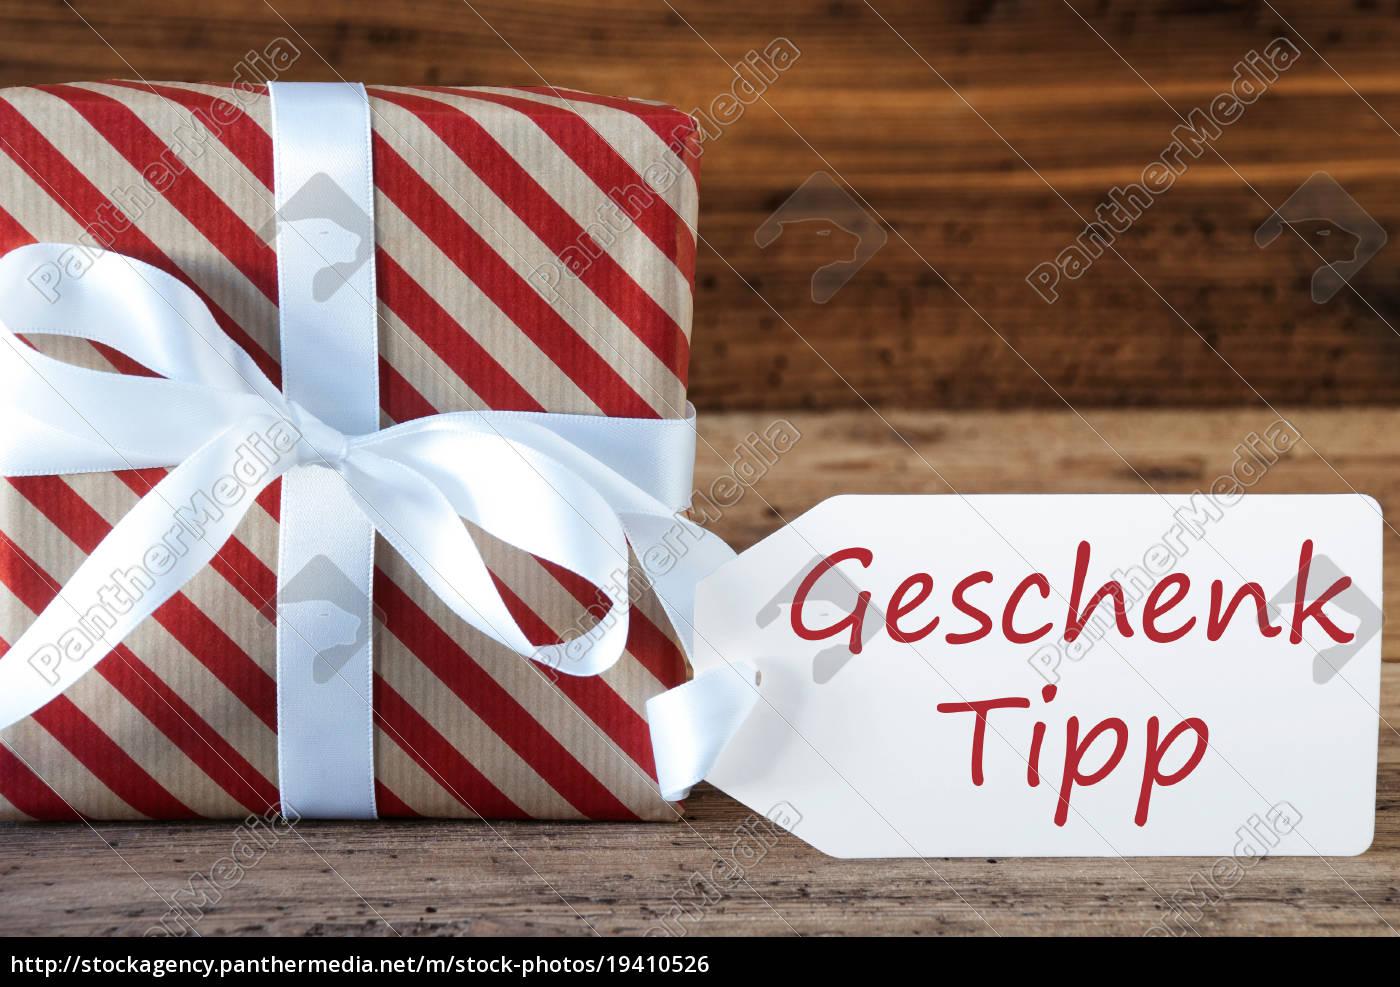 present, with, label, , geschenk, tipp, means - 19410526